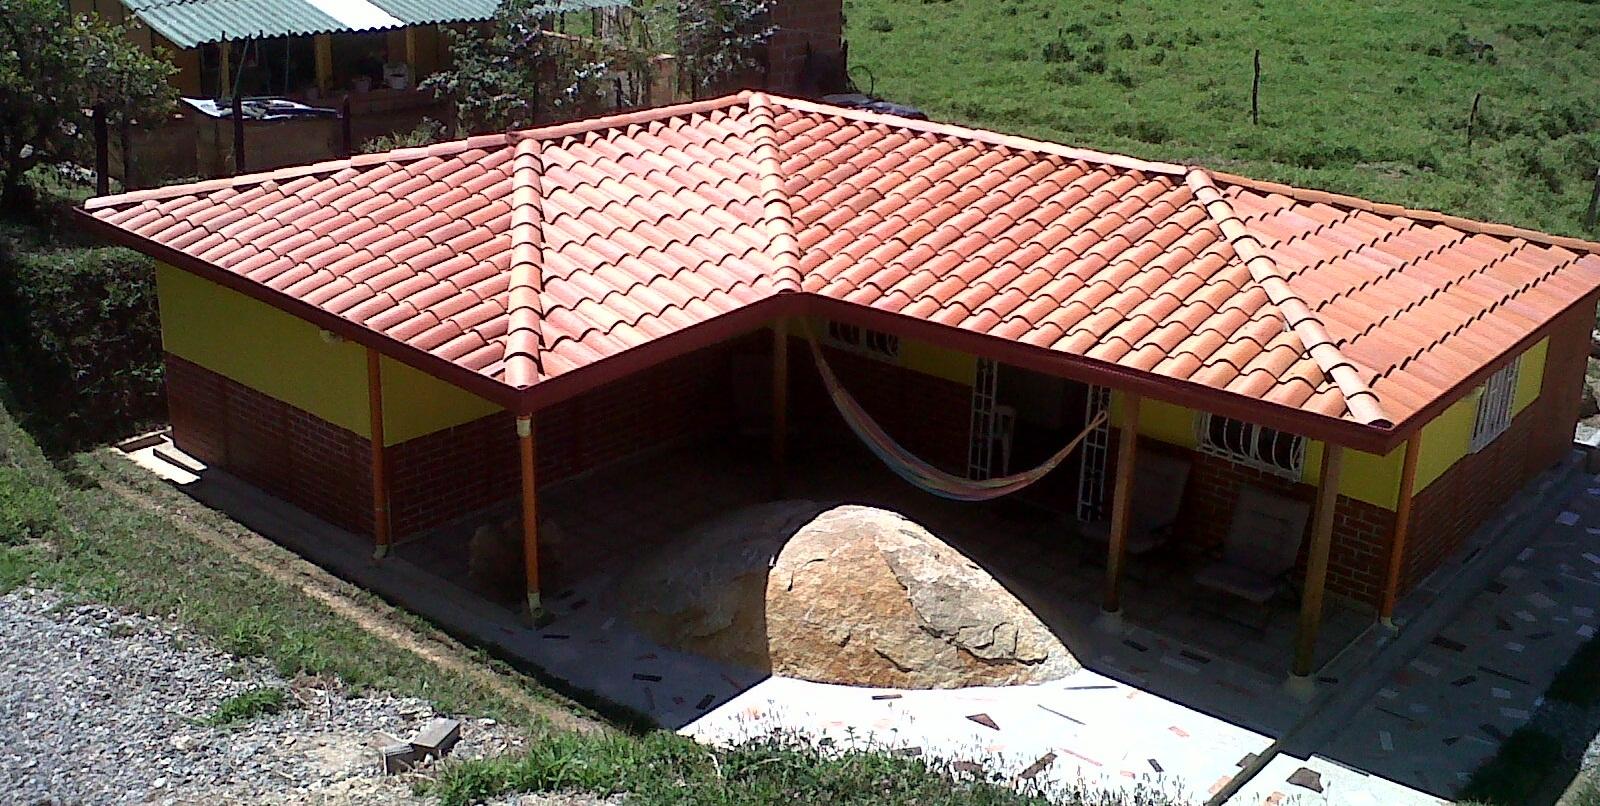 Casas prefabricadas casa real agosto 2013 for Casas techos cuatro aguas